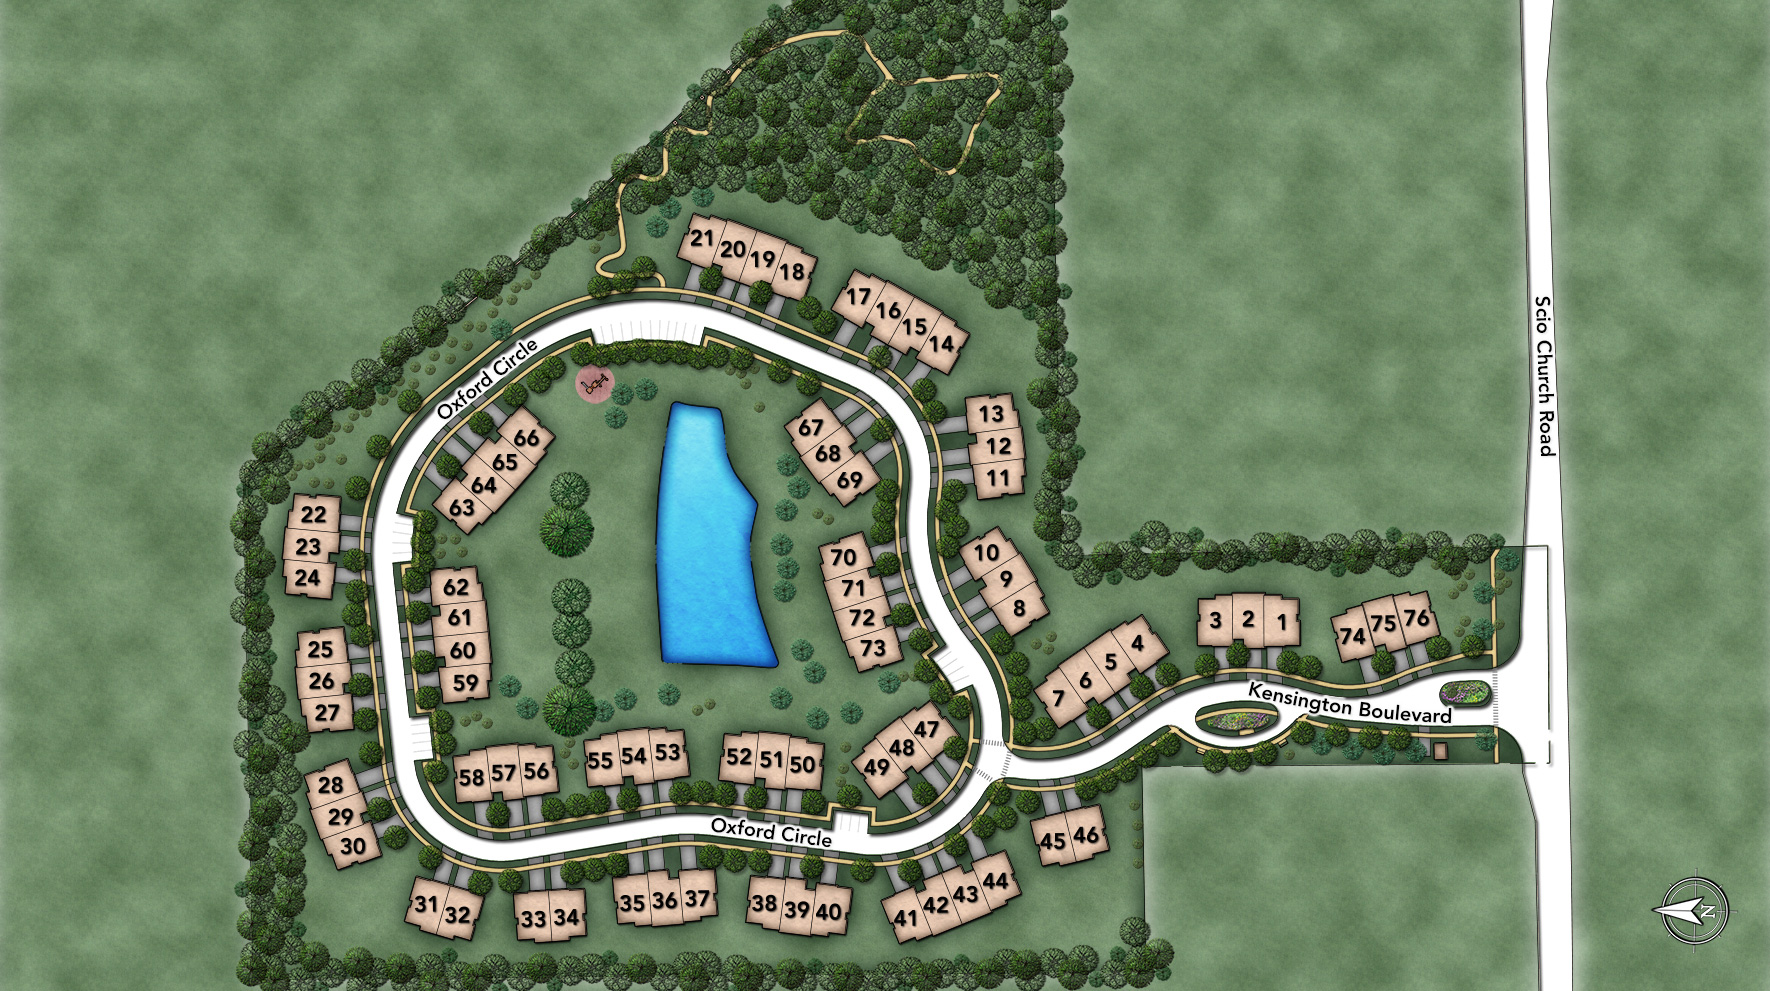 Kensington Woods Site Plan